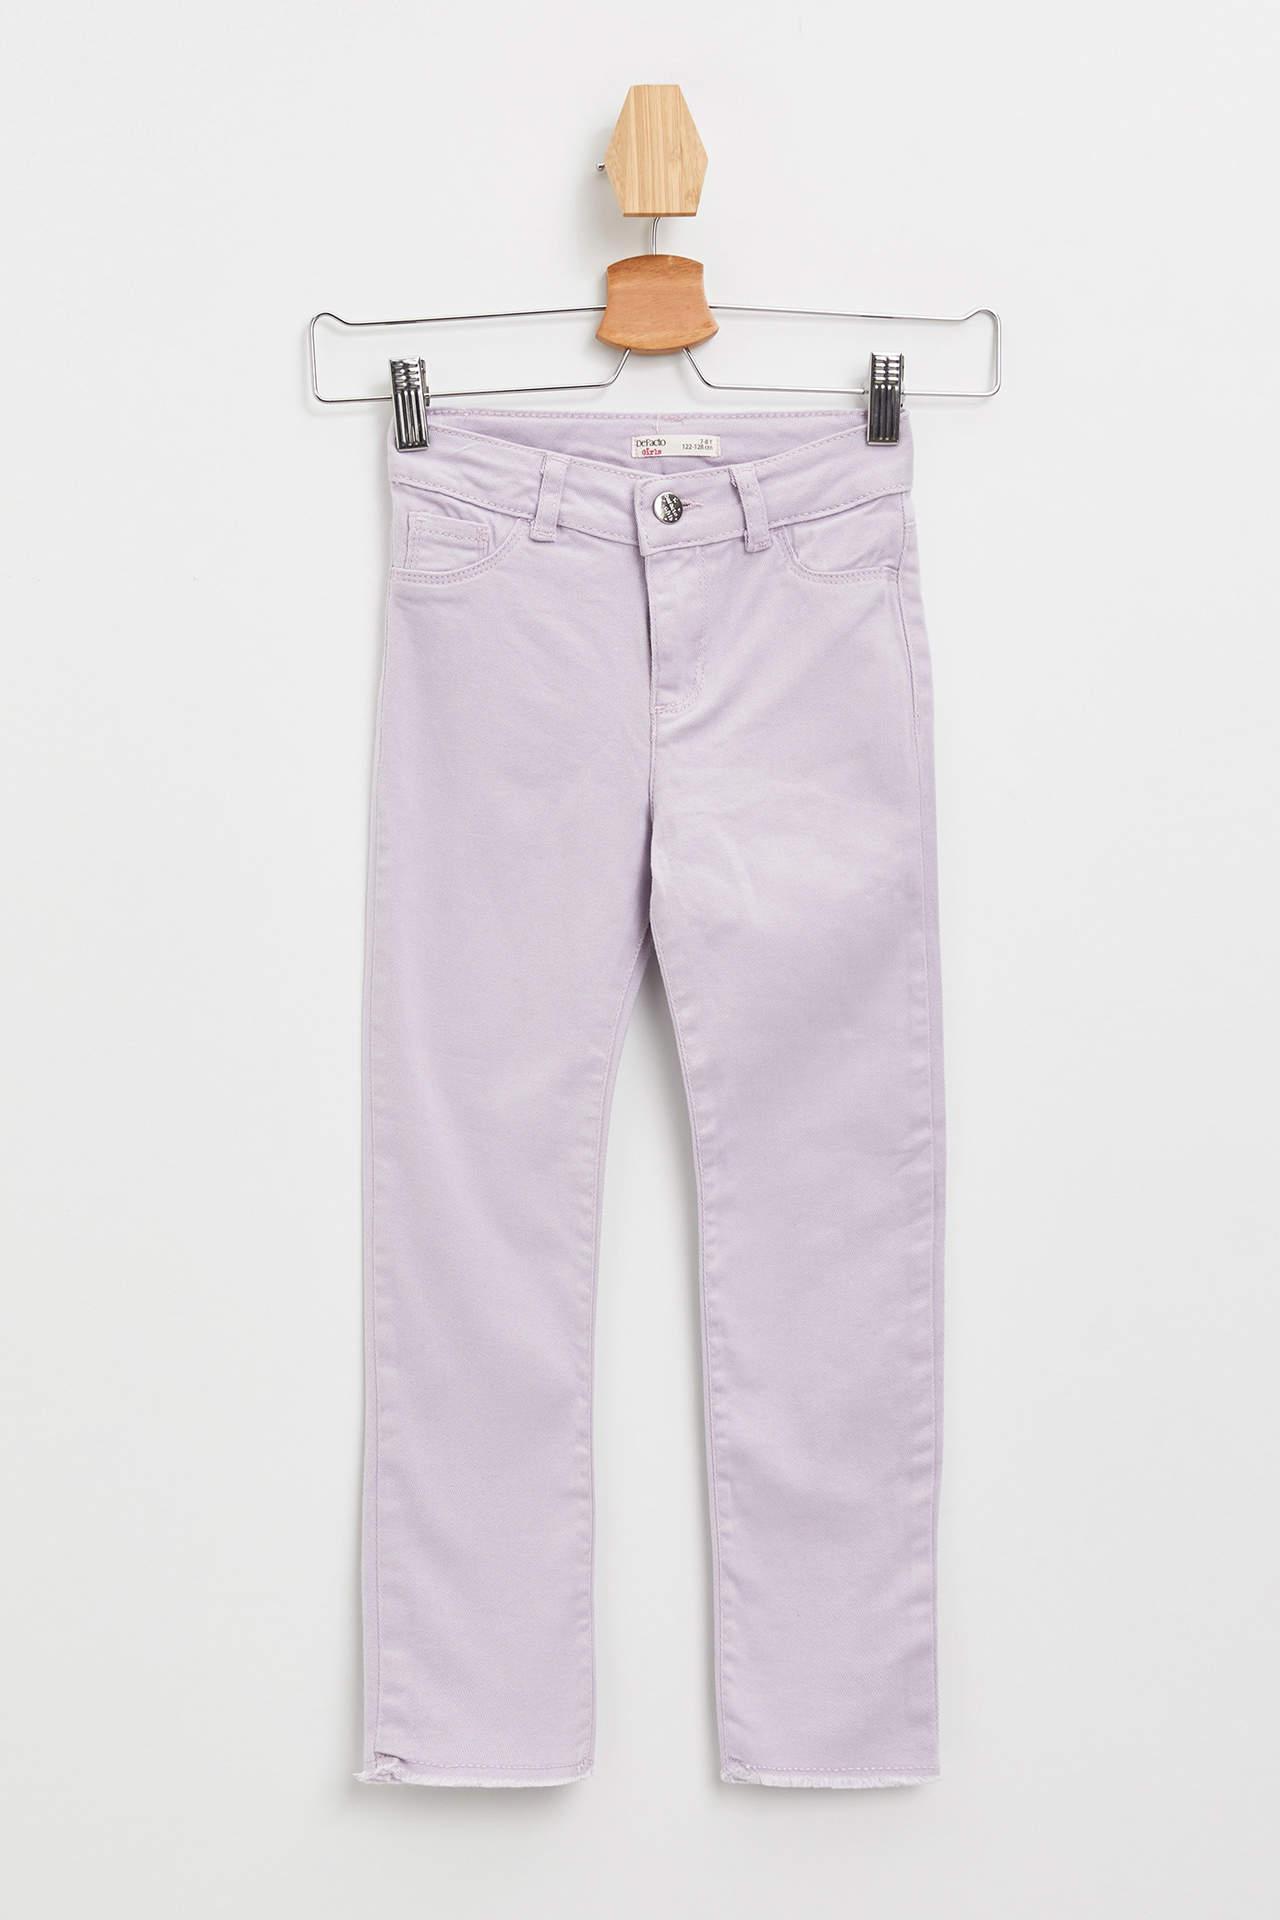 DeFacto Kız Çocuk Slim Fit Gabardin Pantolon Pembe female